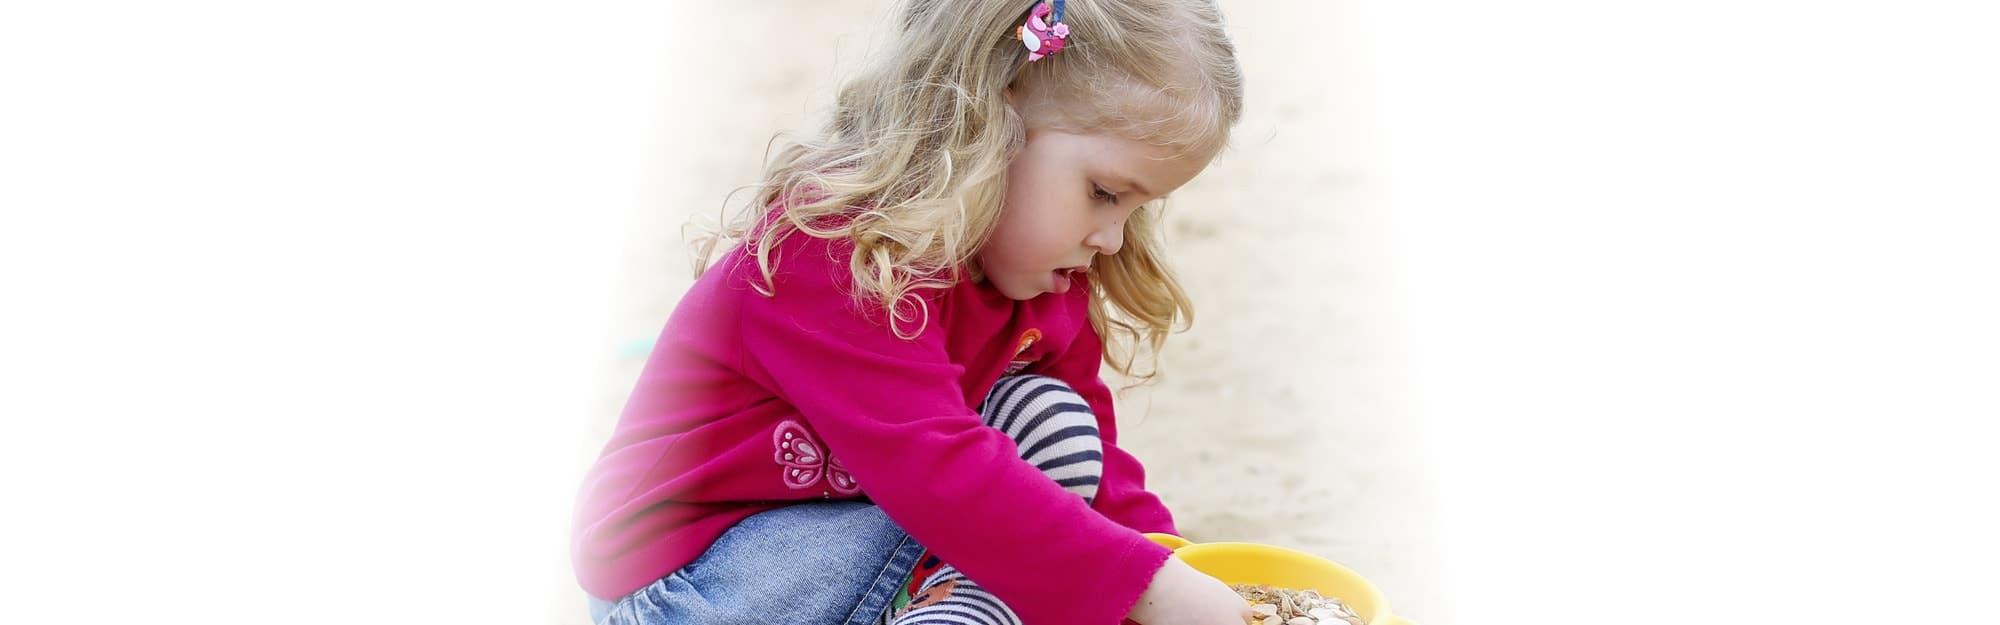 Webgrafik_Børn med tilknytningsproblemer